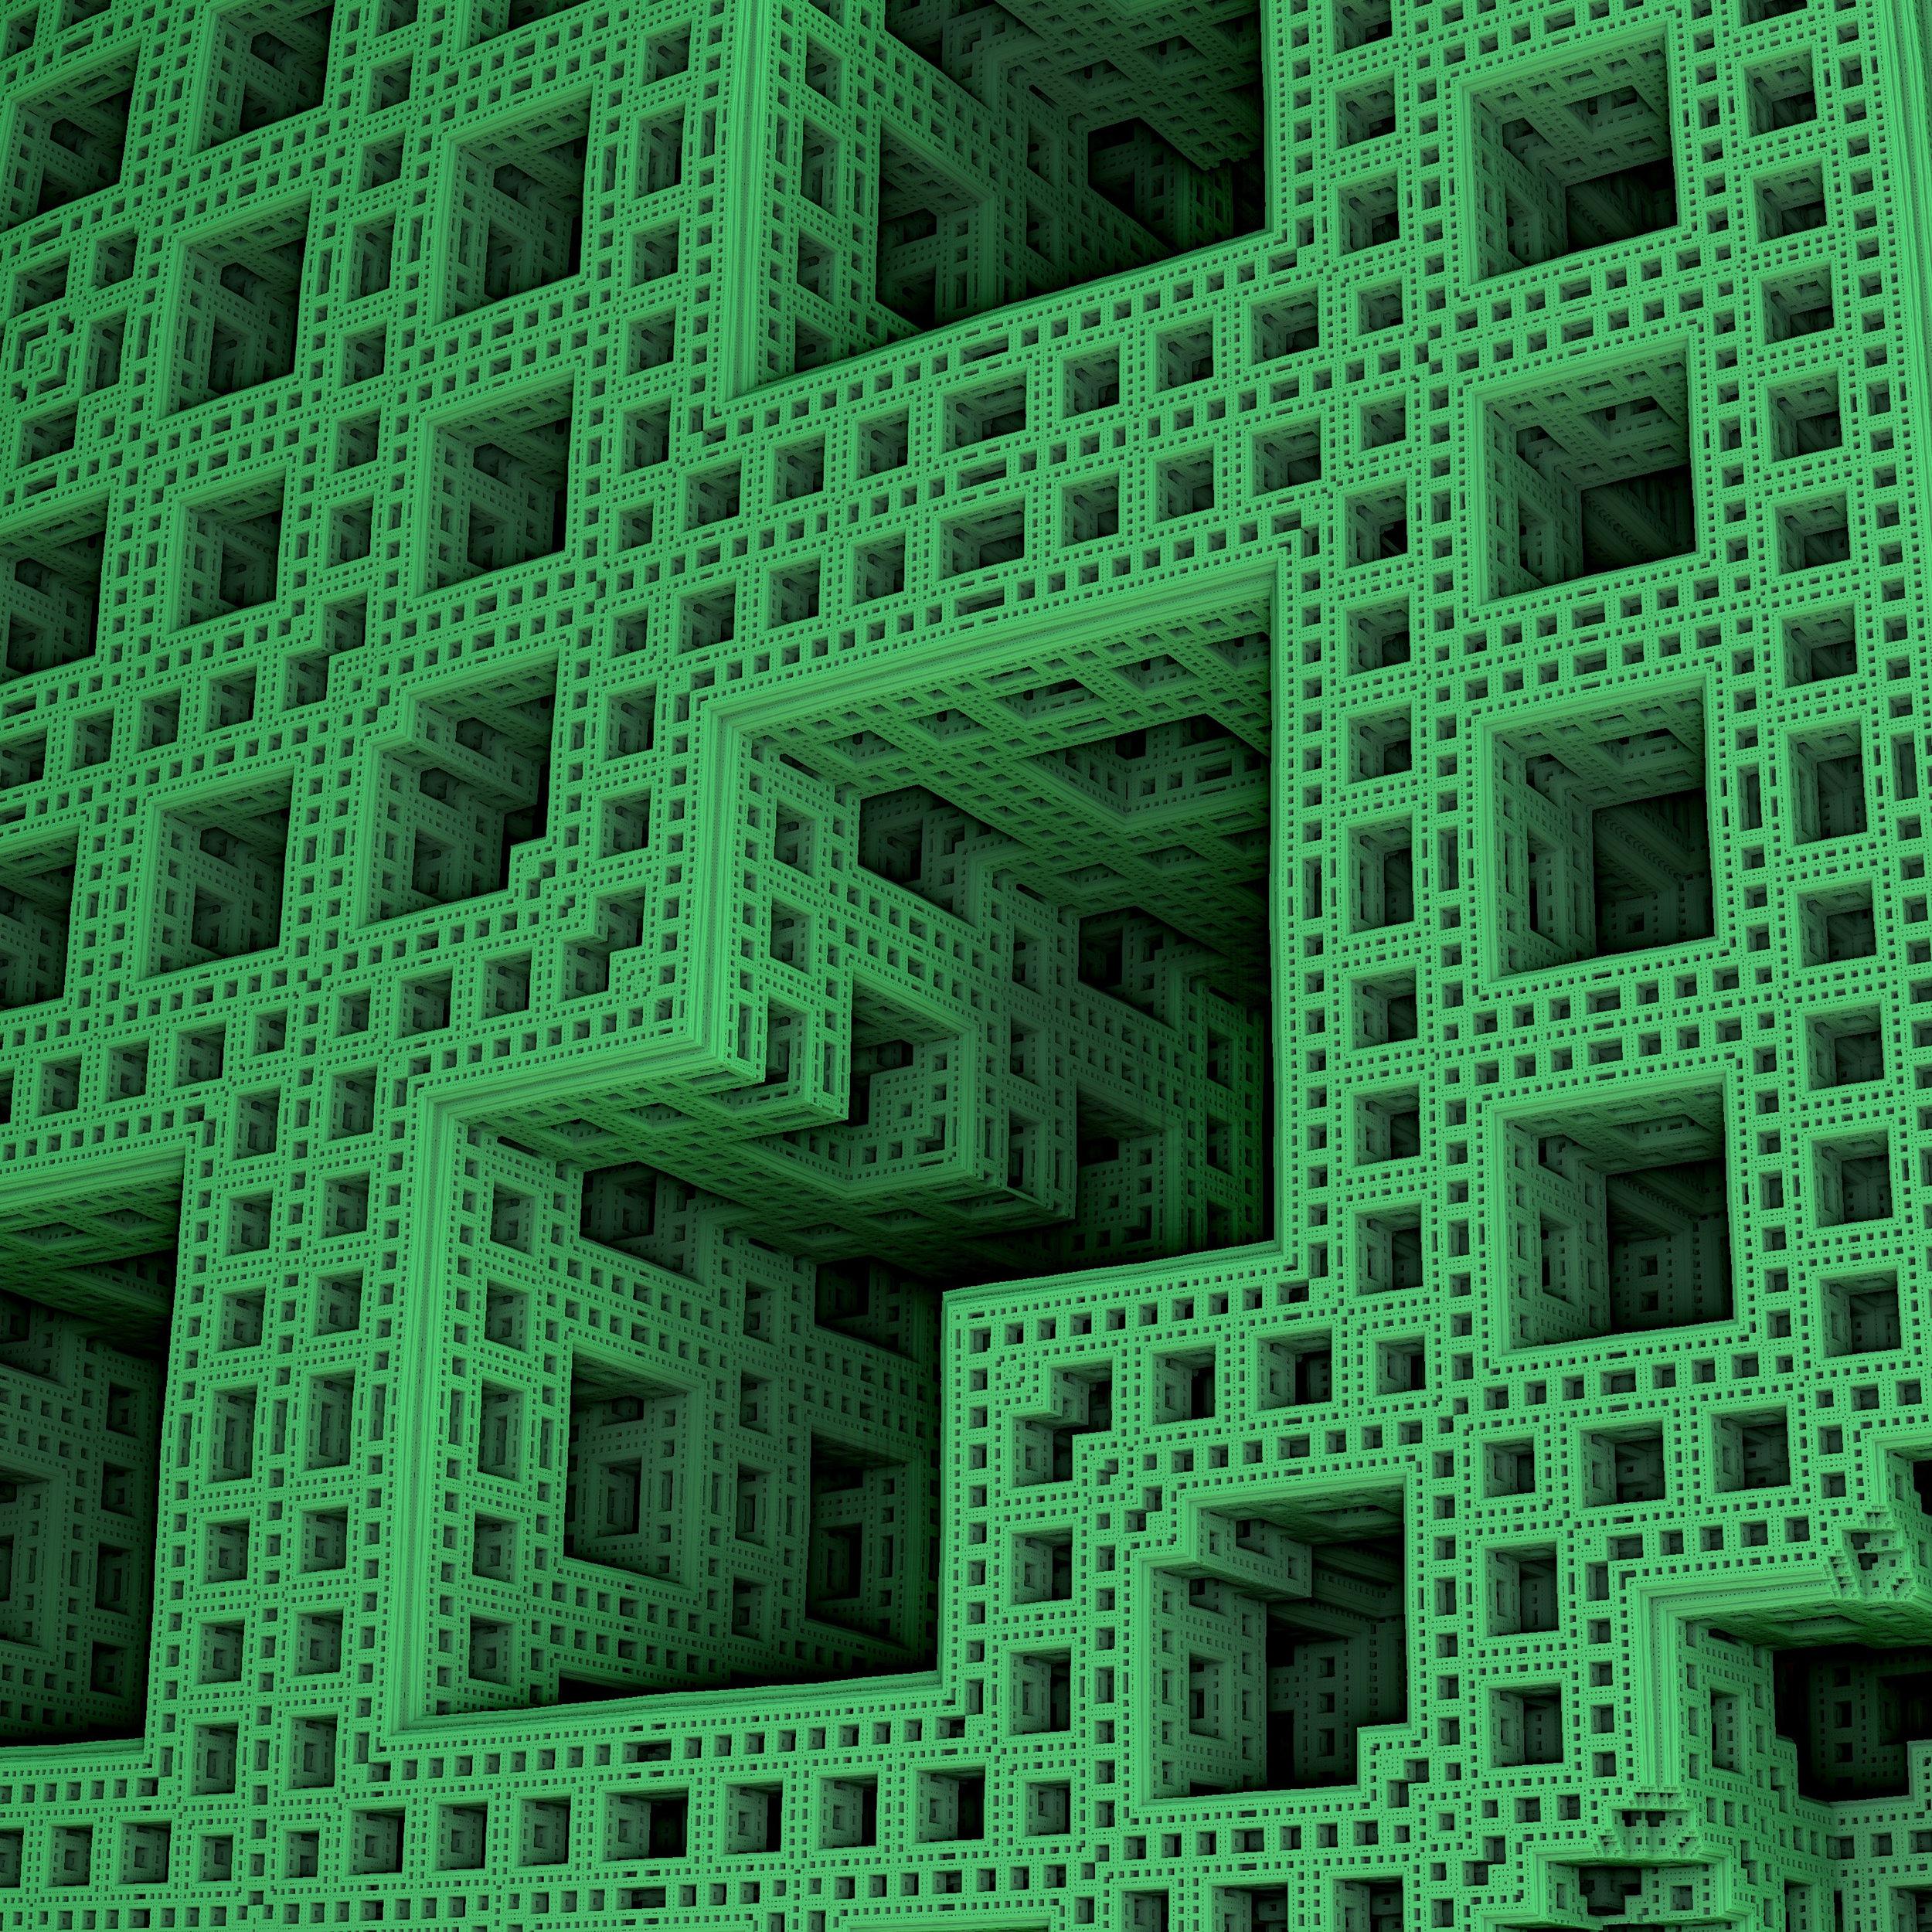 Algorithmics_3000_SquareHero.jpg